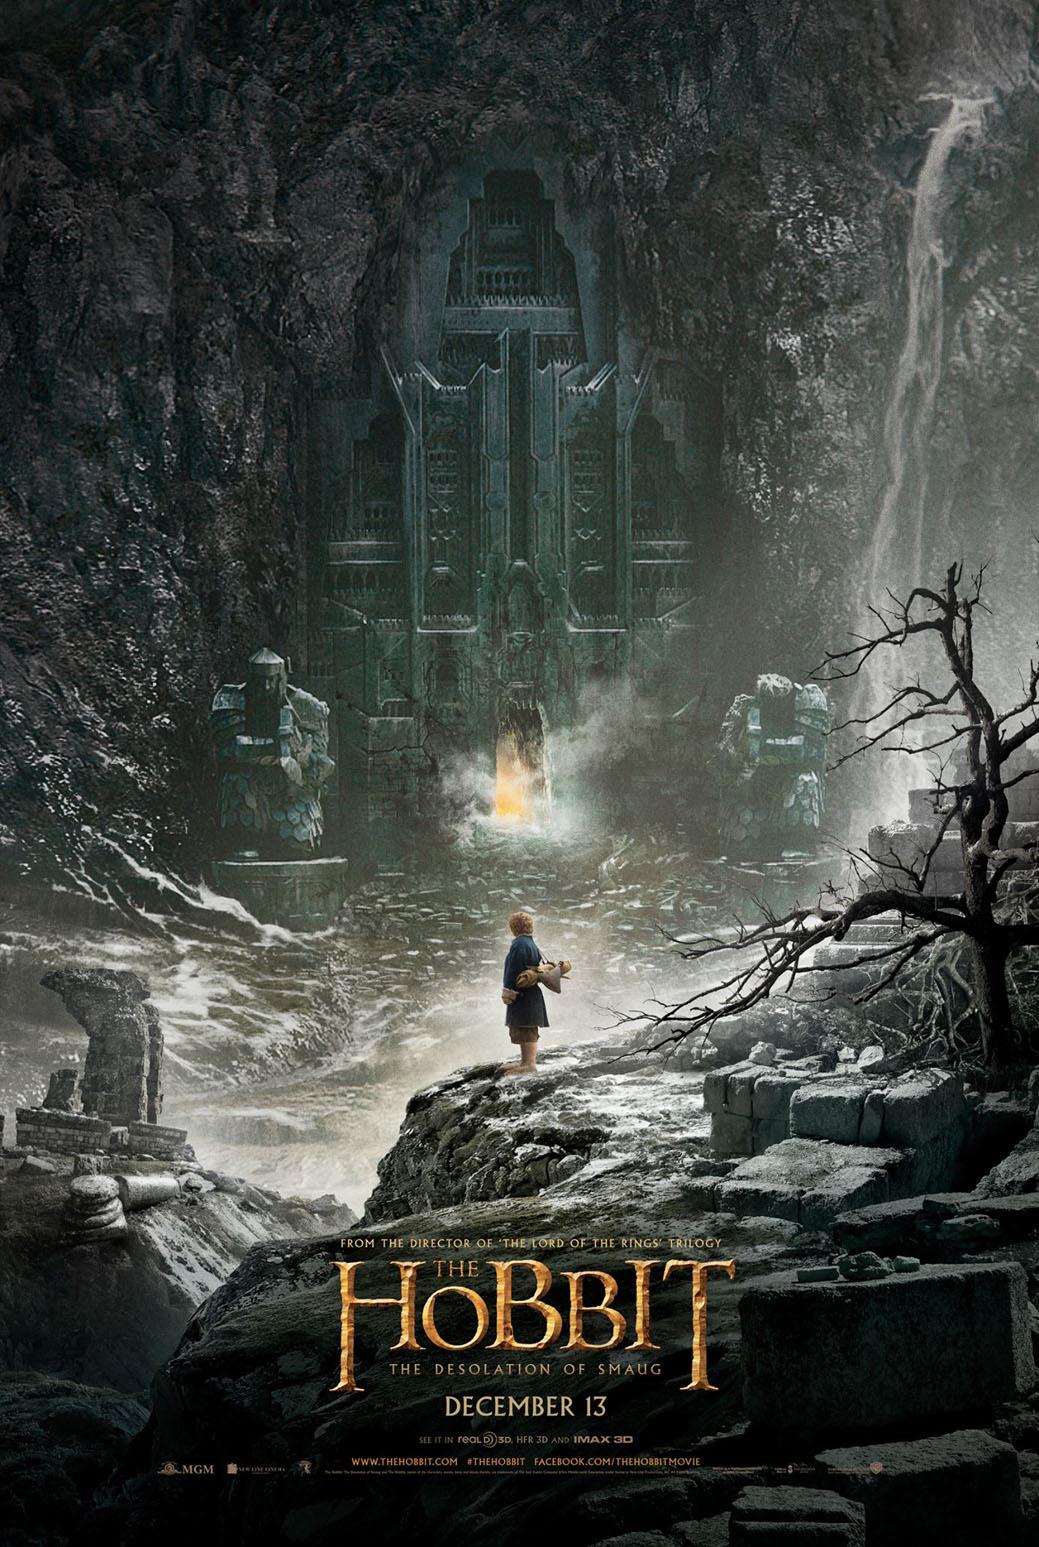 Poster_04_Hobbit_DesolationOfSmaug.jpg